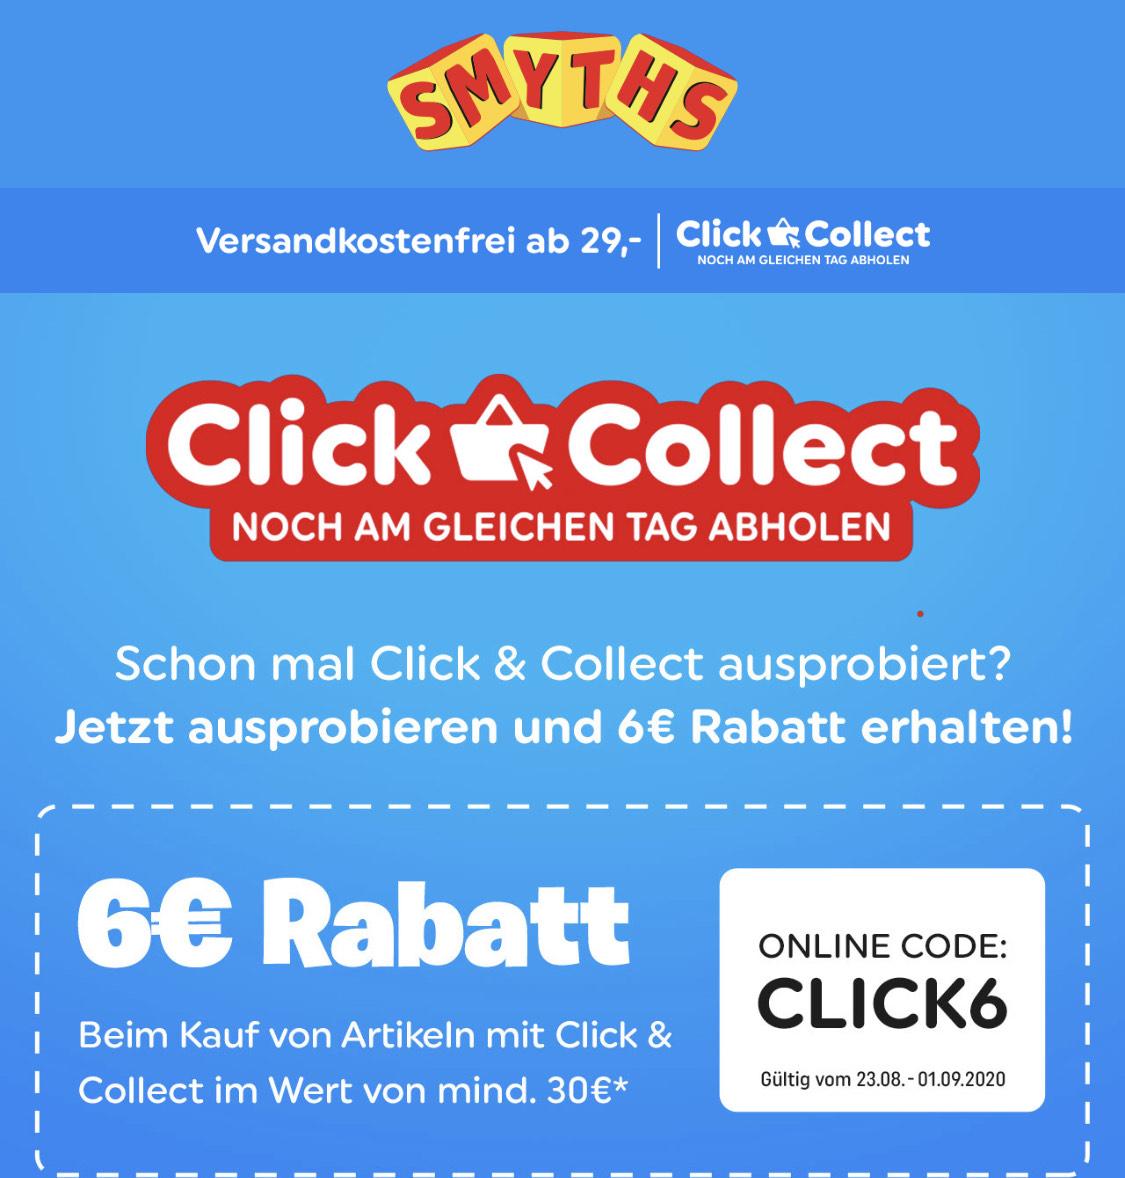 Smyths 6€ Rabatt ab €30 bei Click & Collect